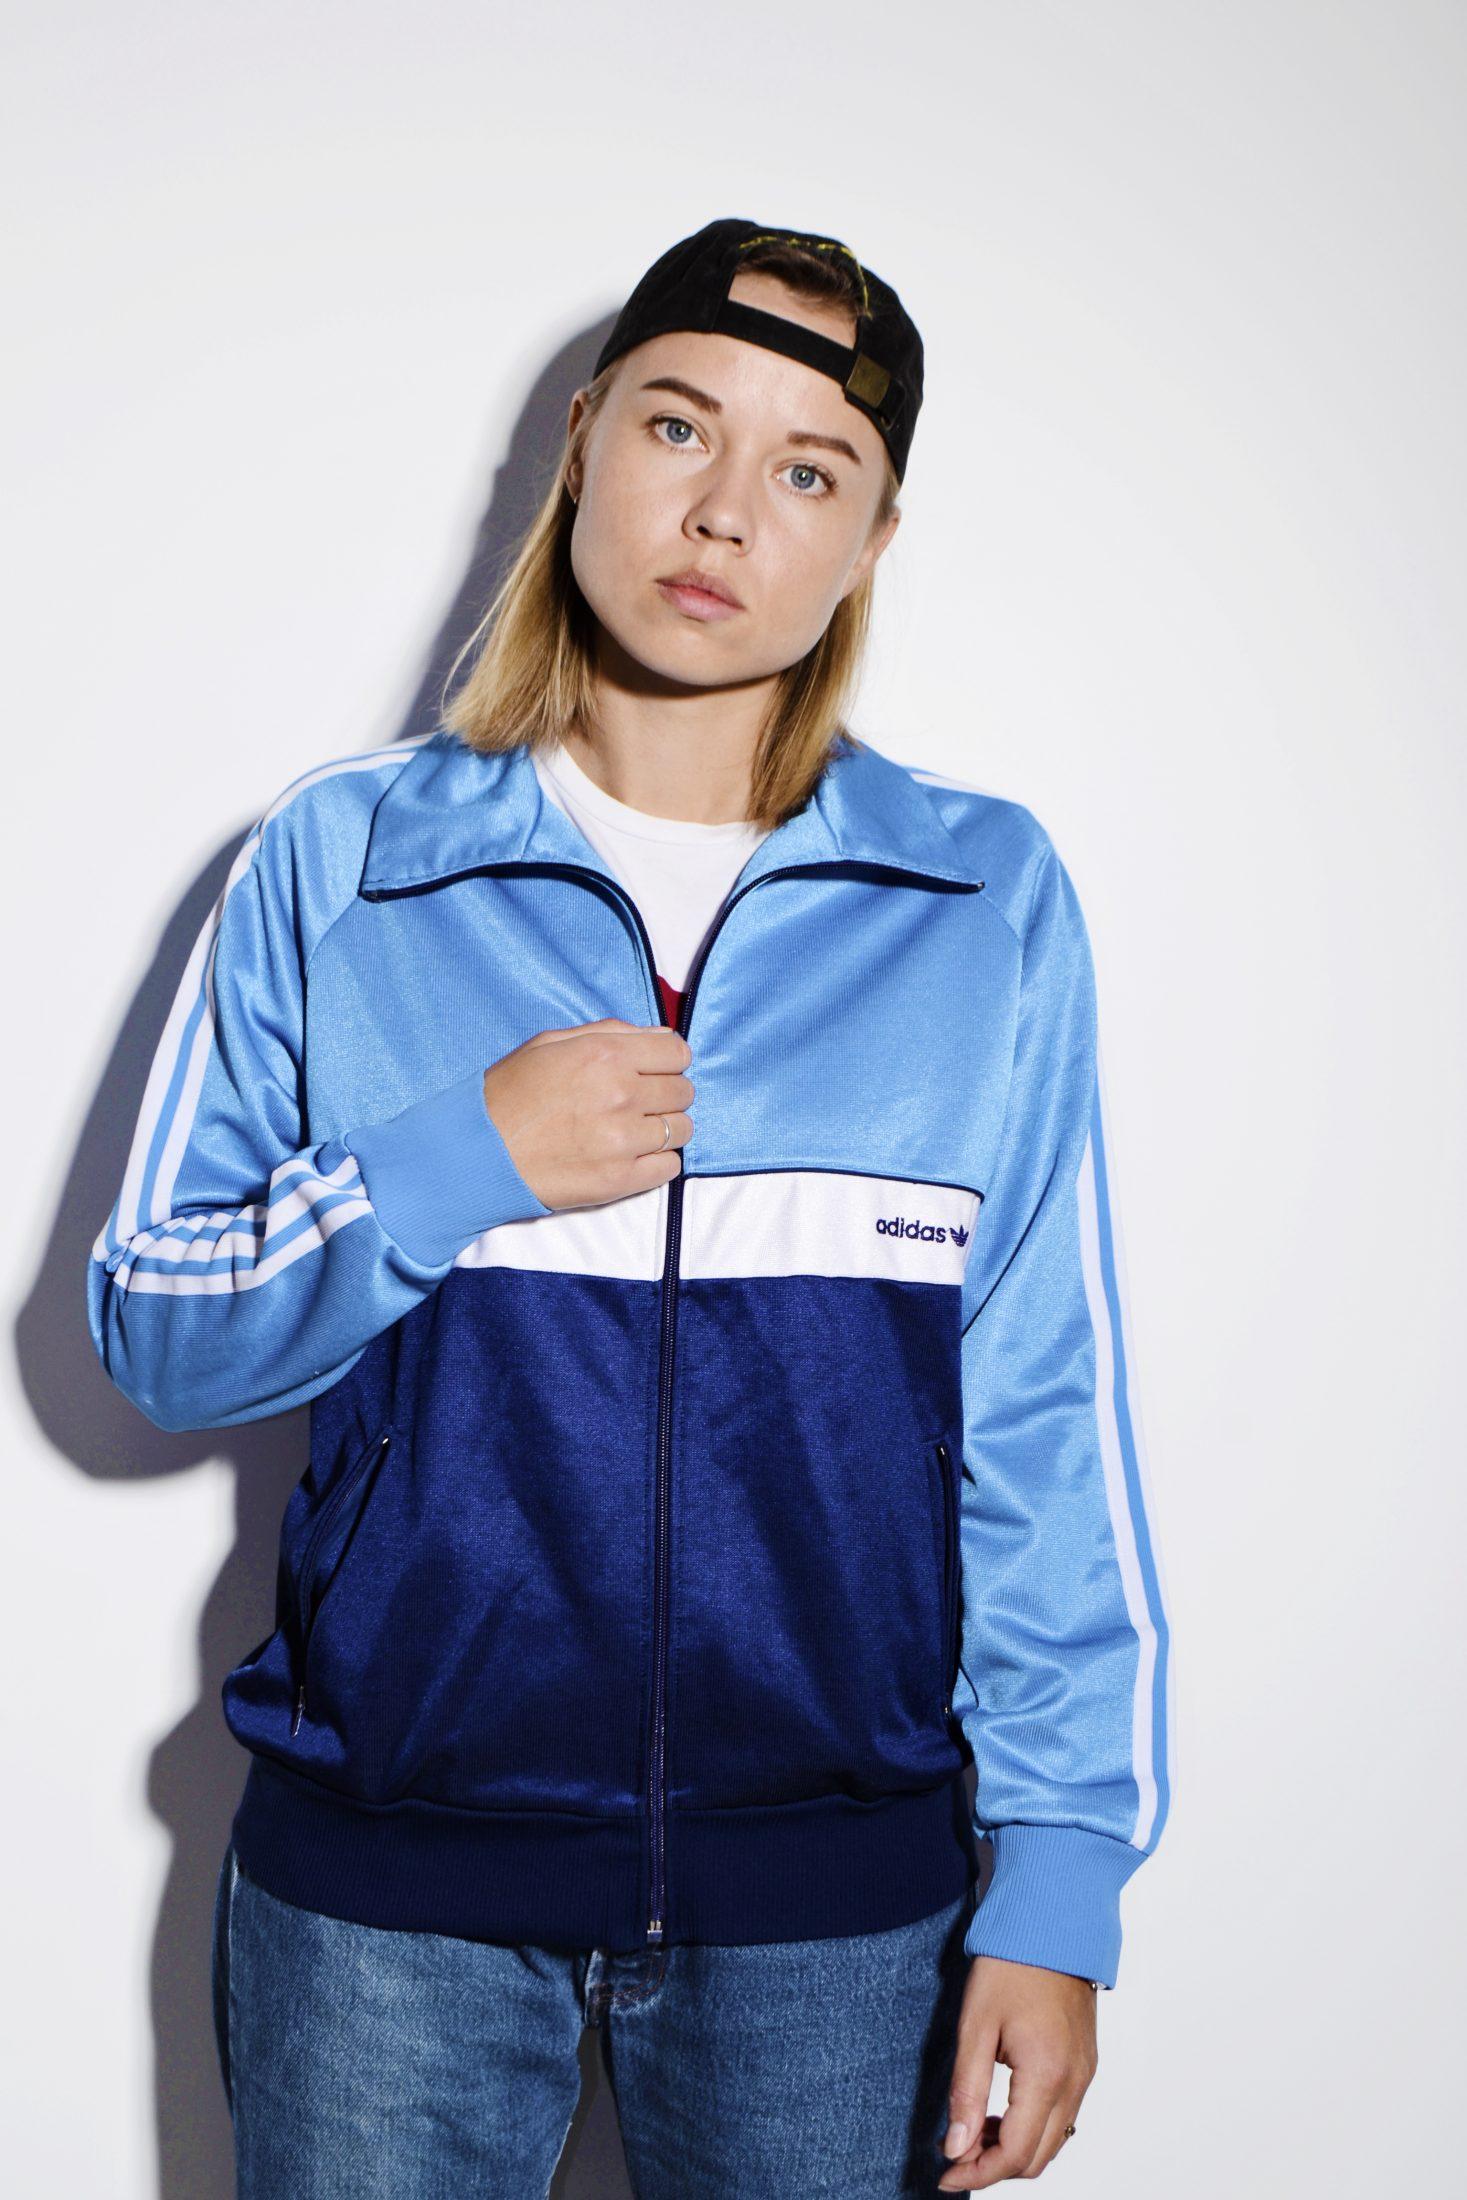 47c4c985d28f6c Adidas Originals 90s blue jacket | HOT MILK 90s clothing online store